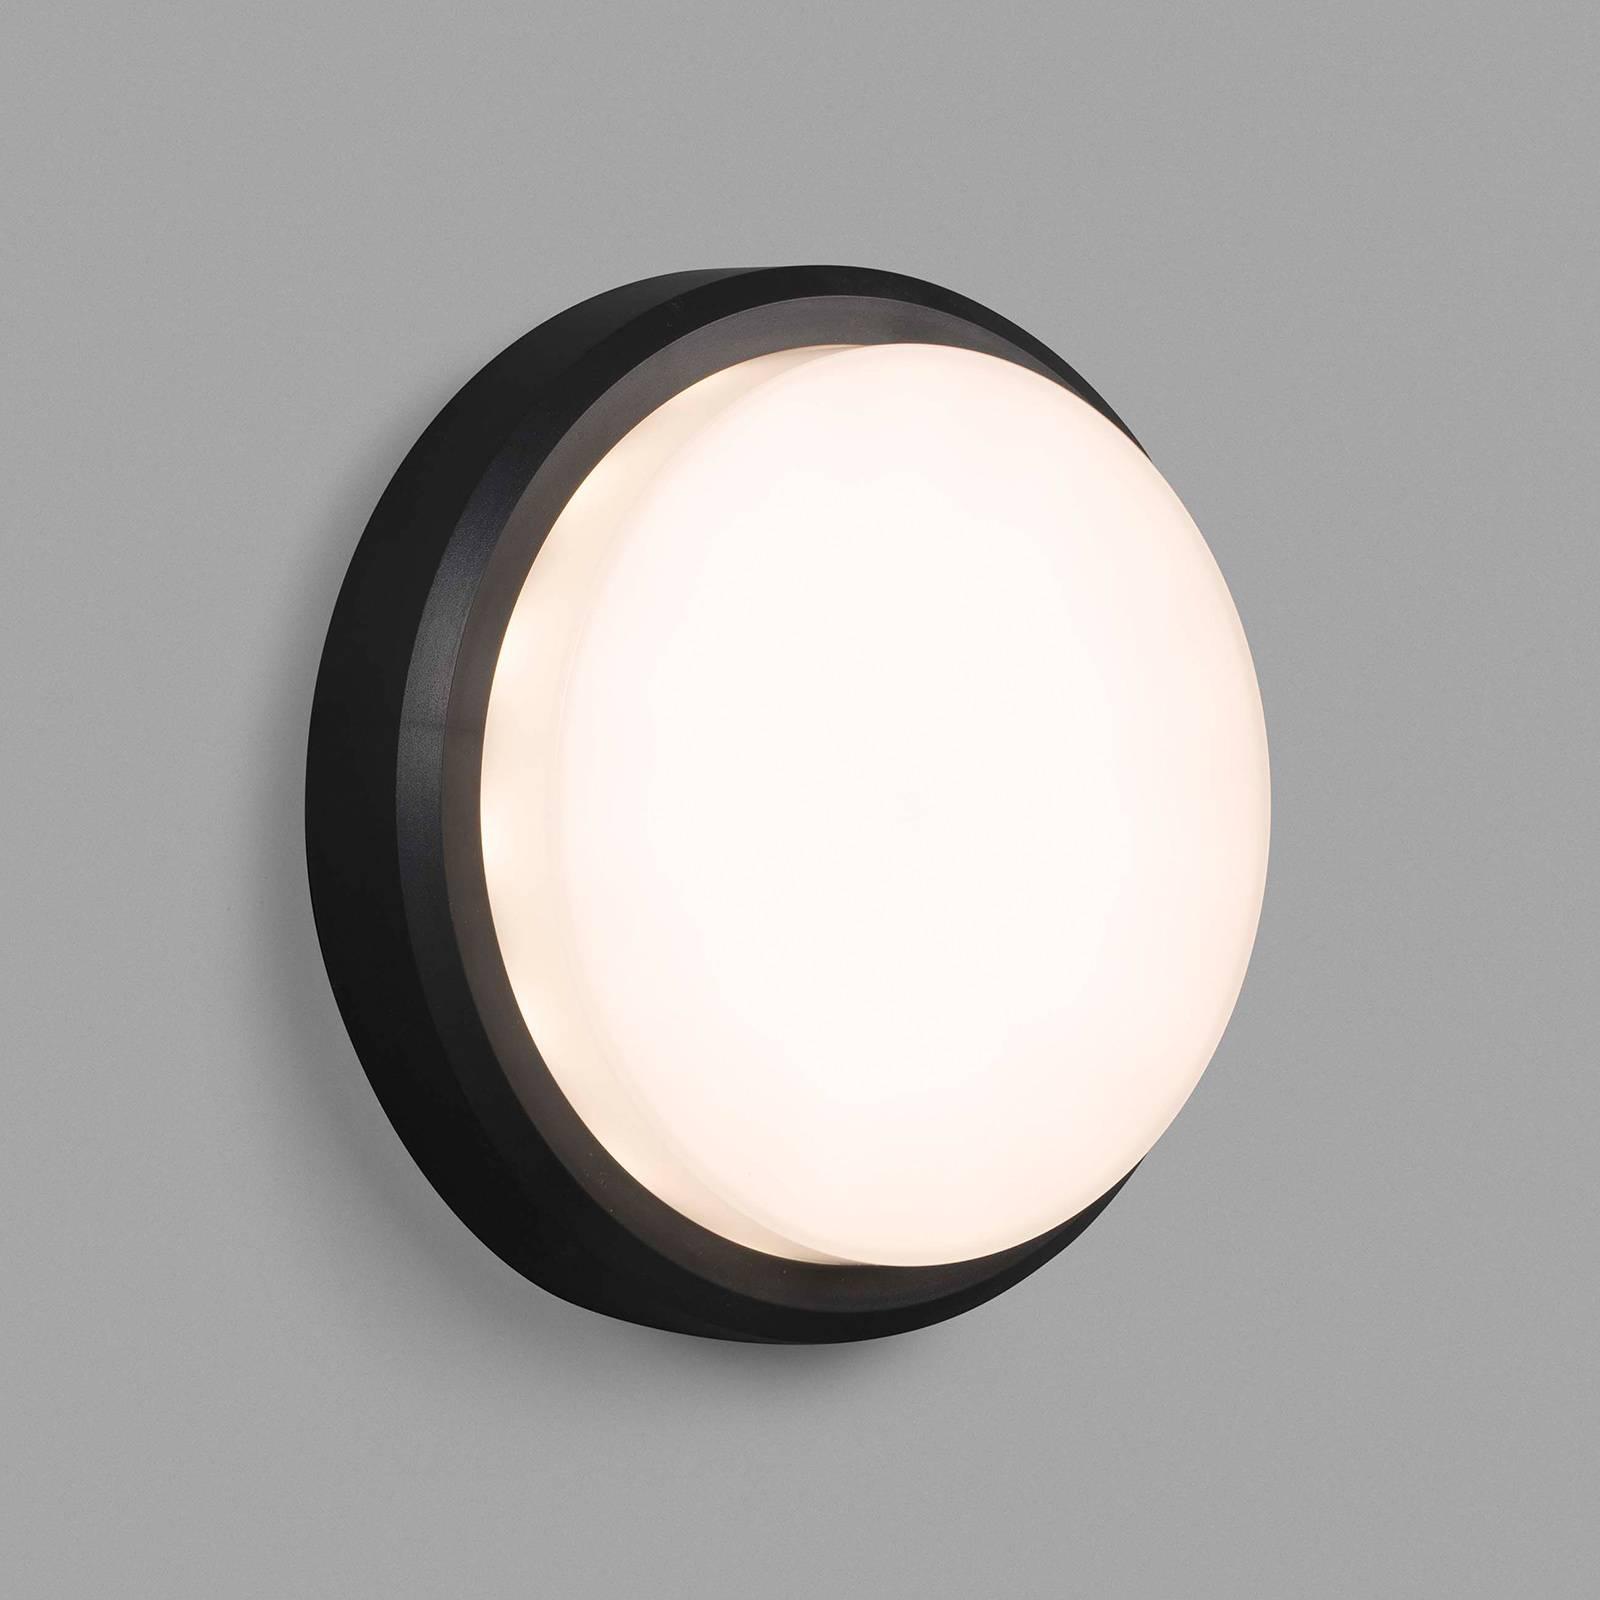 LED buitenwandlamp Tom XL, IK10, donkergrijs/wit